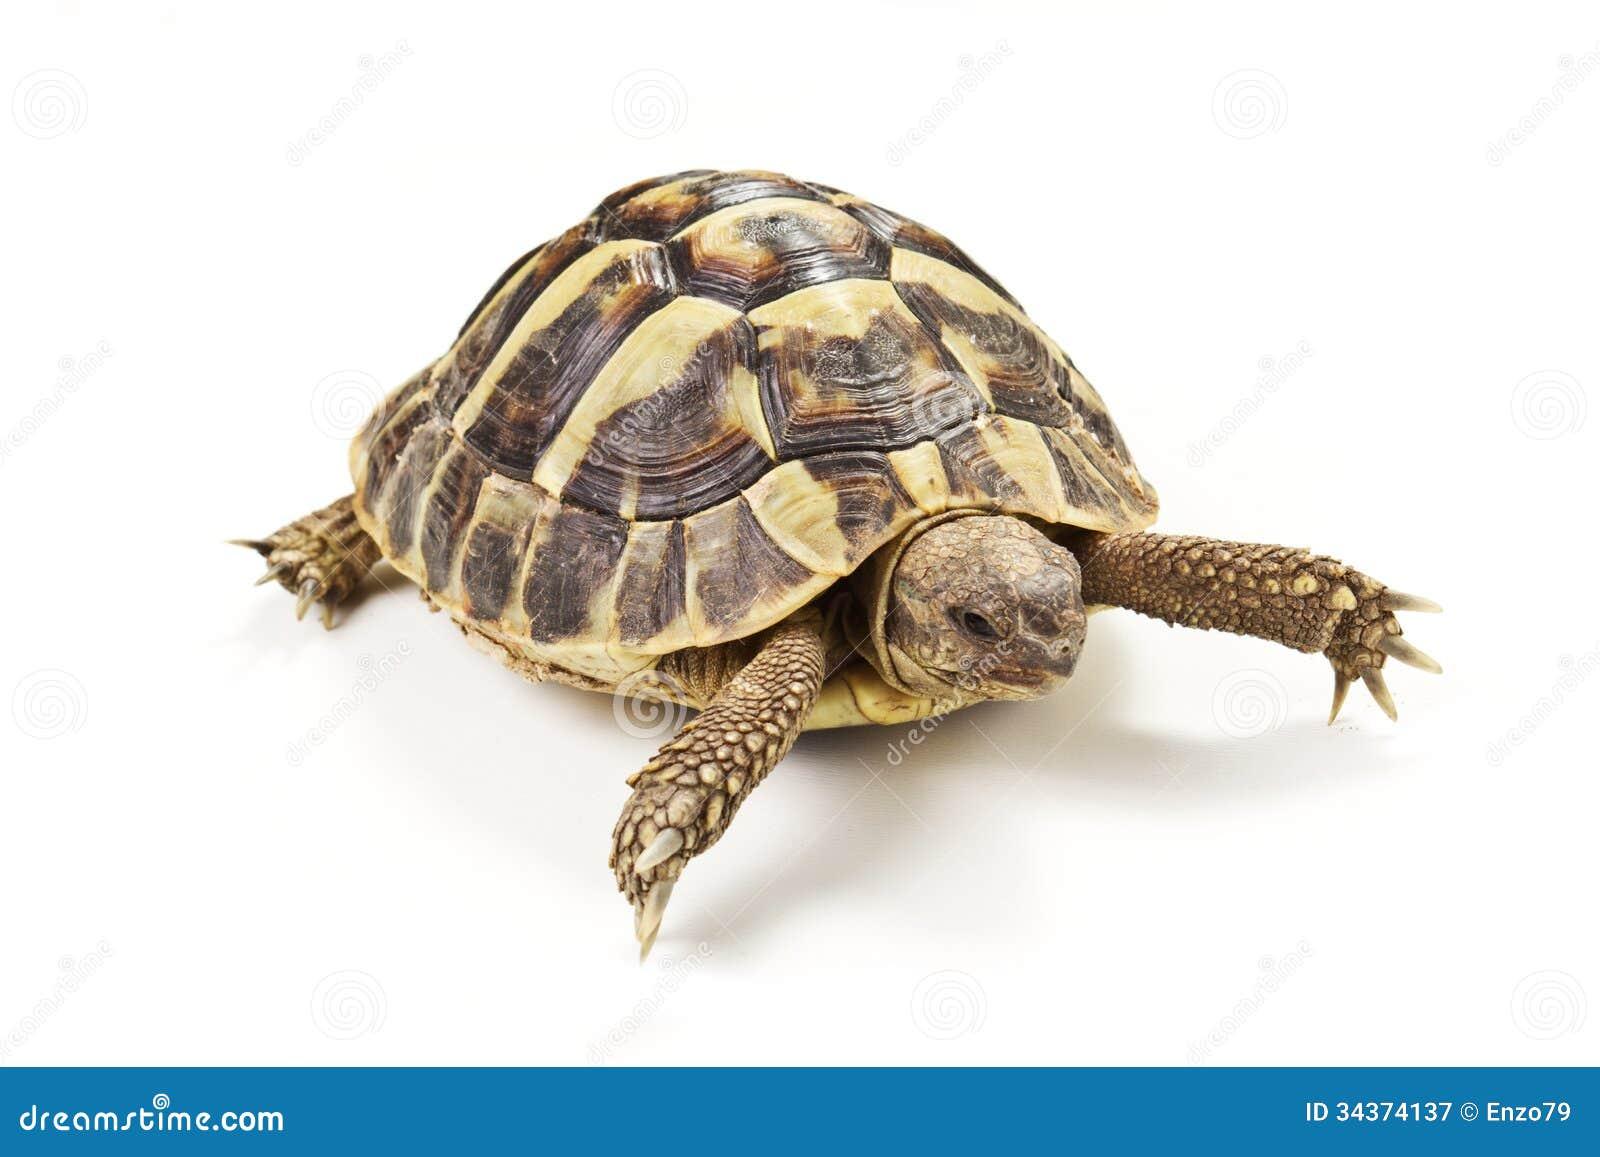 turtle white background - photo #27